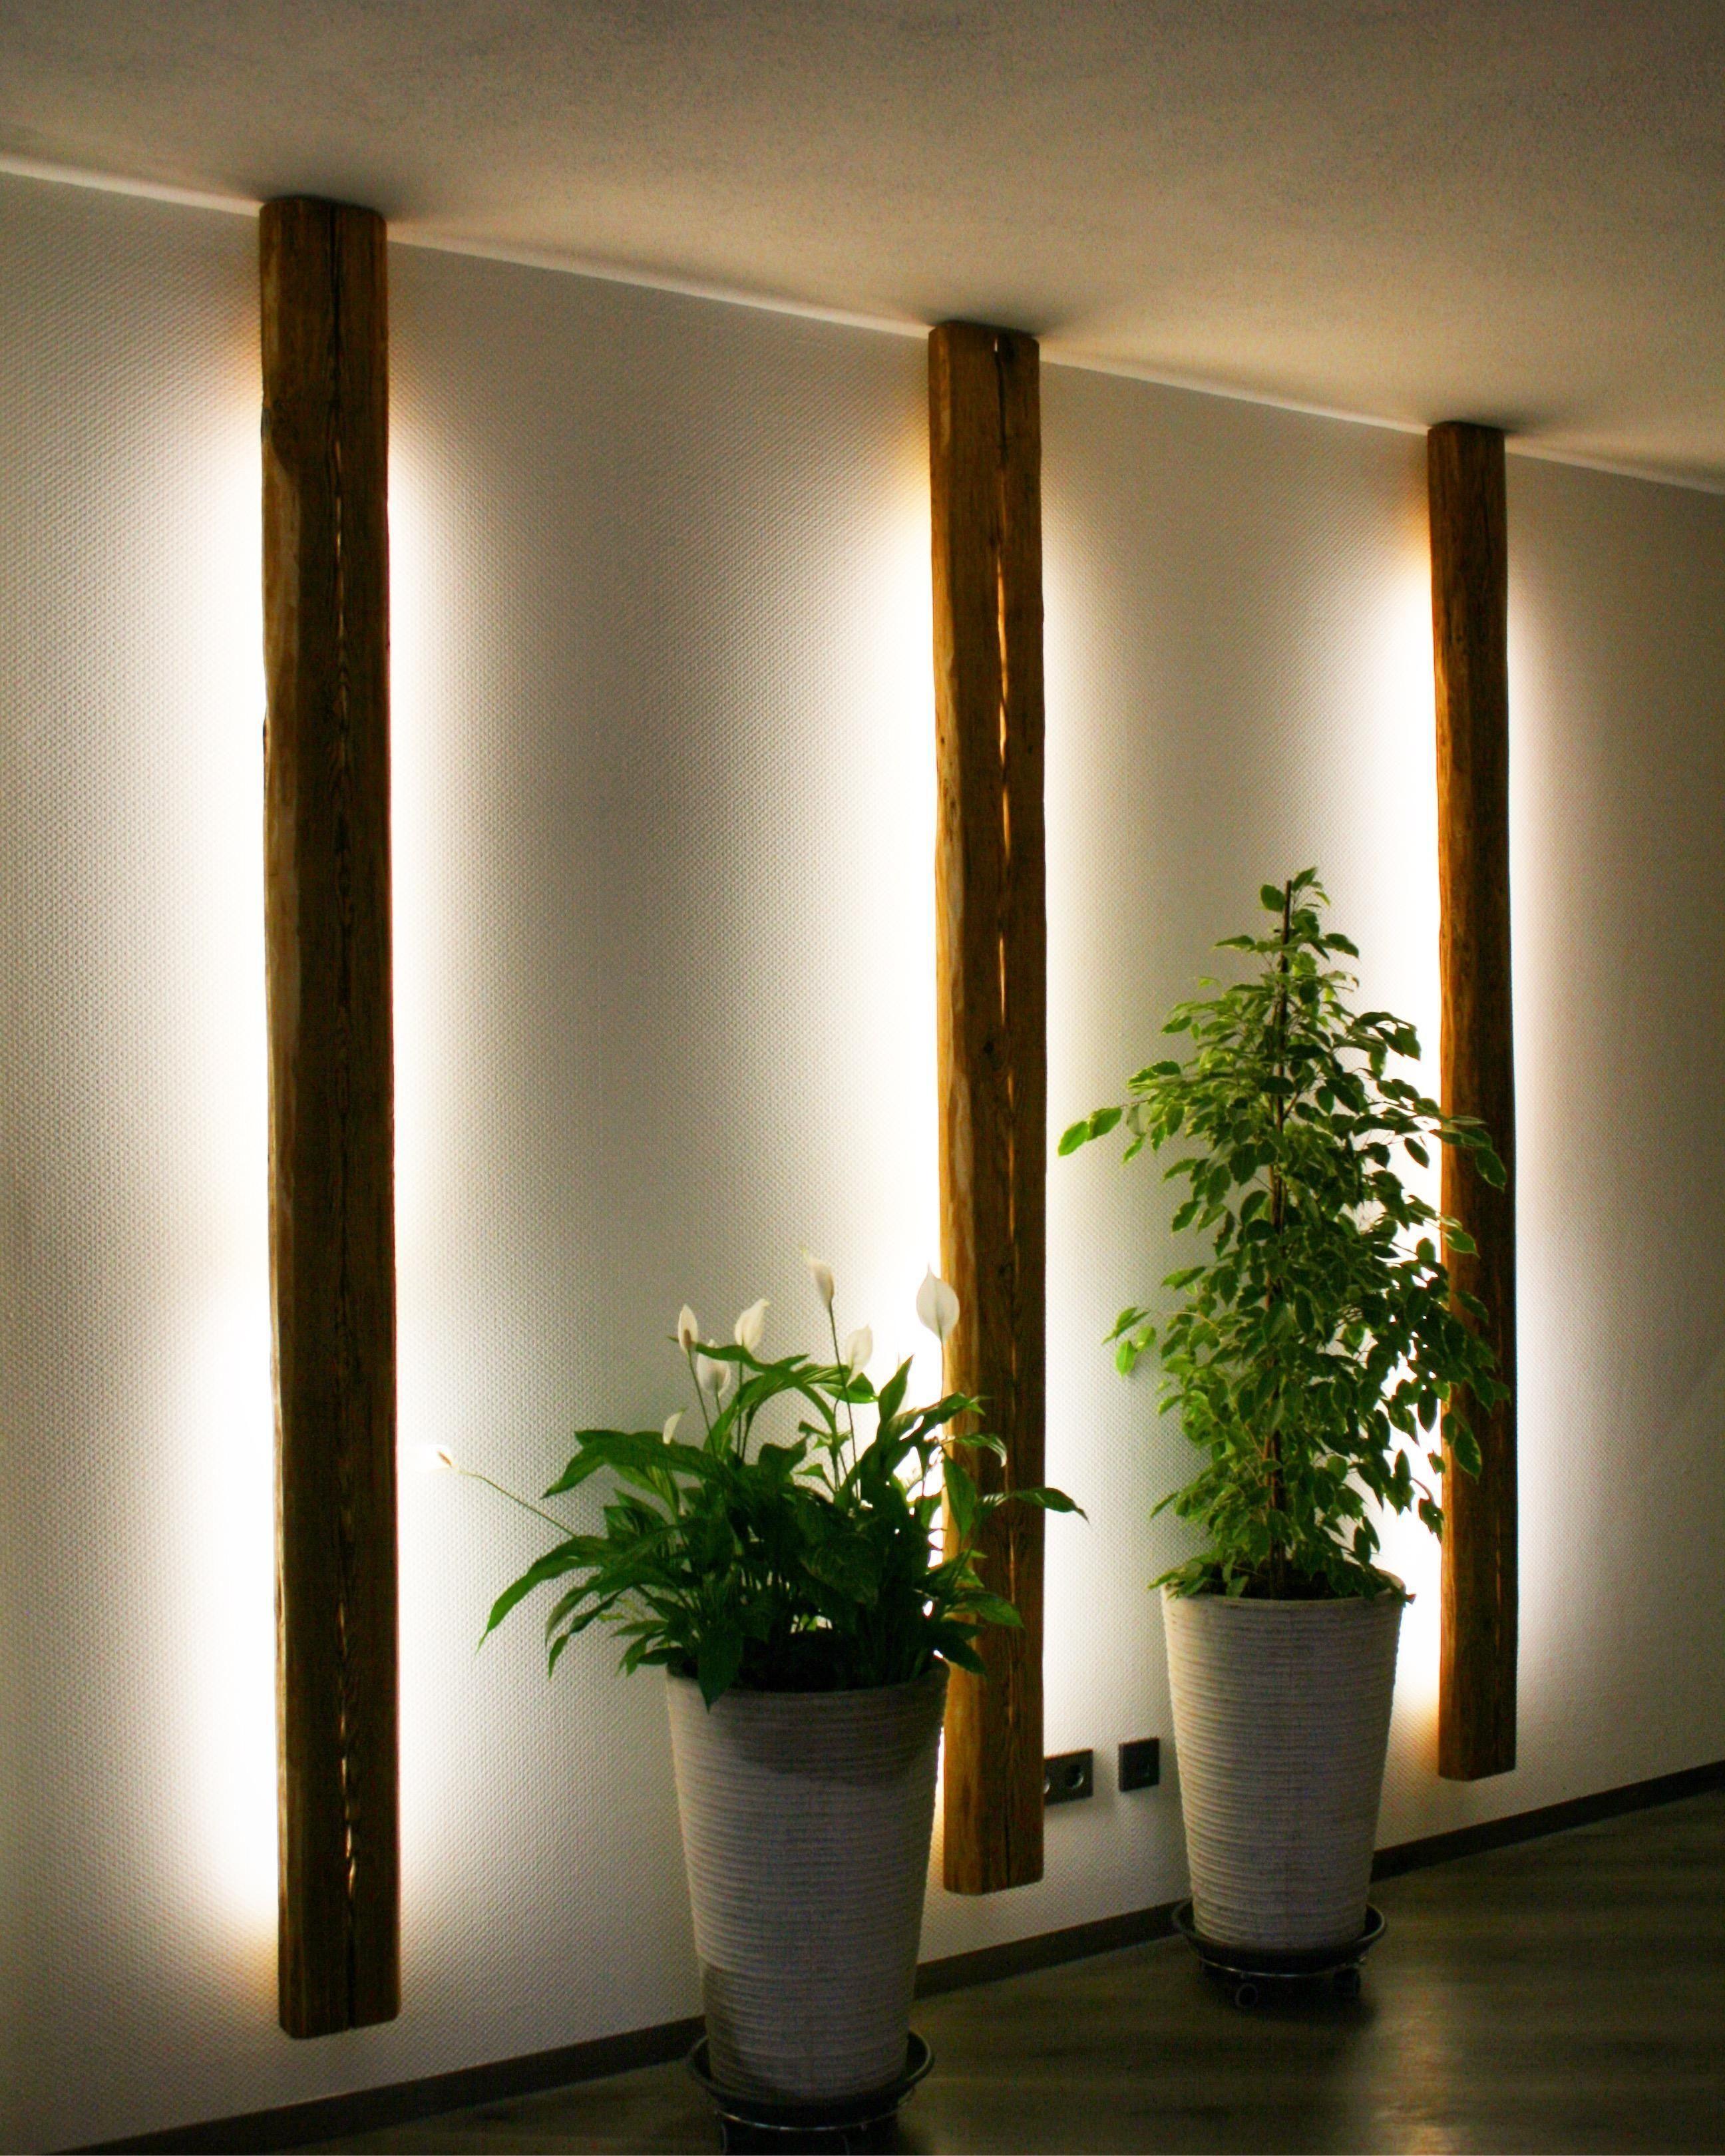 Lampe Aus Altholz Sorgt Fur Indirektes Licht Beso Indirektes Licht Beleuchtungsideen Und Beleuchtung Fur Zuhause